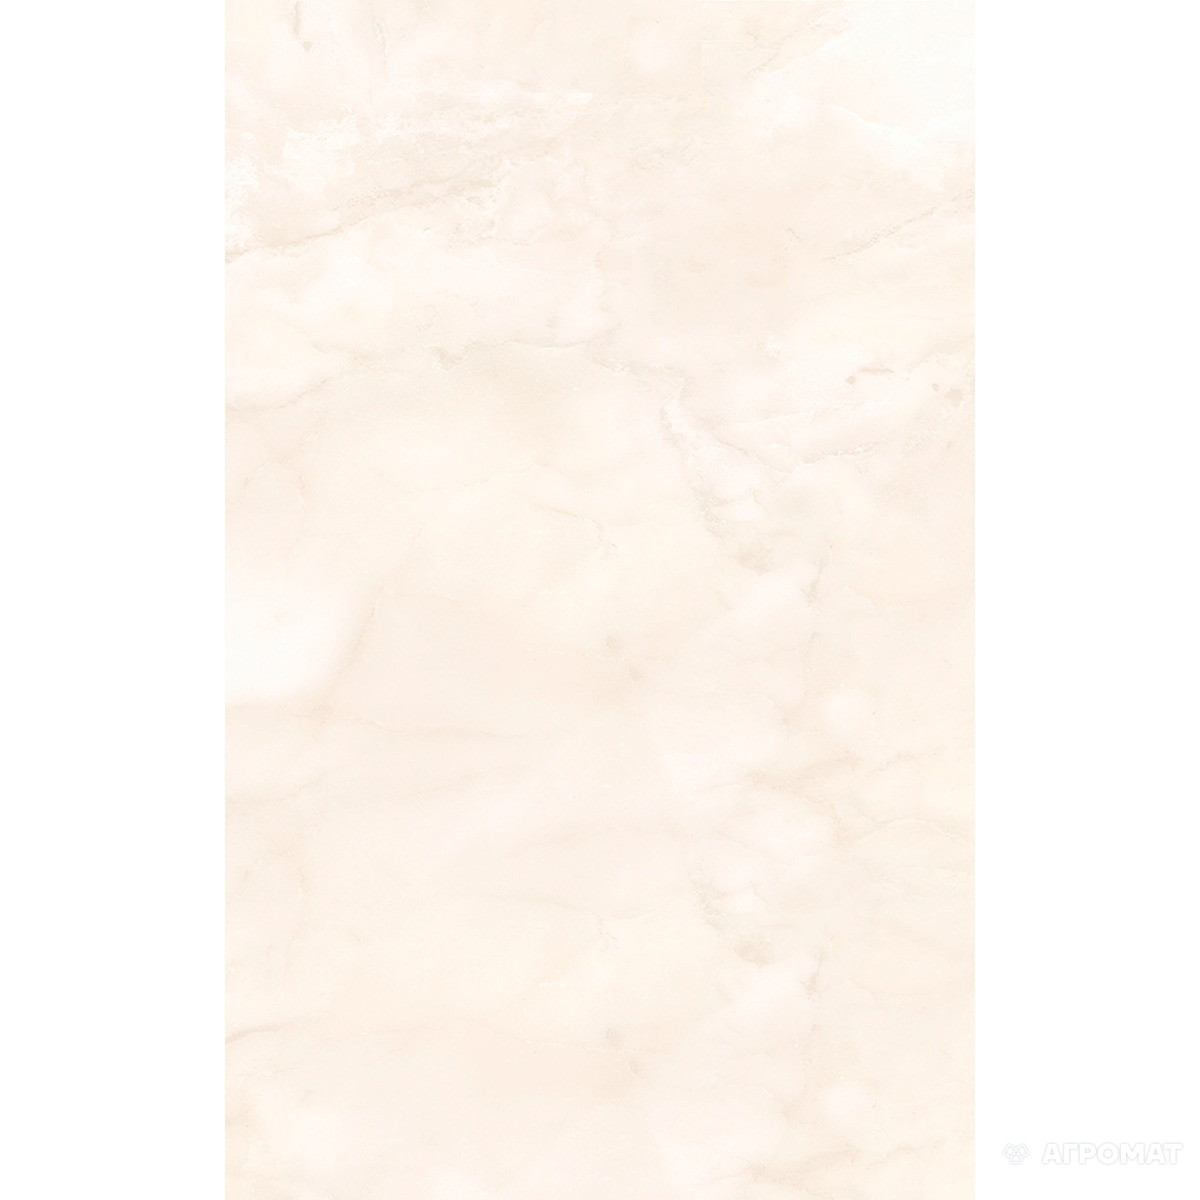 Плитка GOLDEN TILE Октава ОКТАВА БЕЖЕВЫЙ СВЕТЛЫЙ Г51051